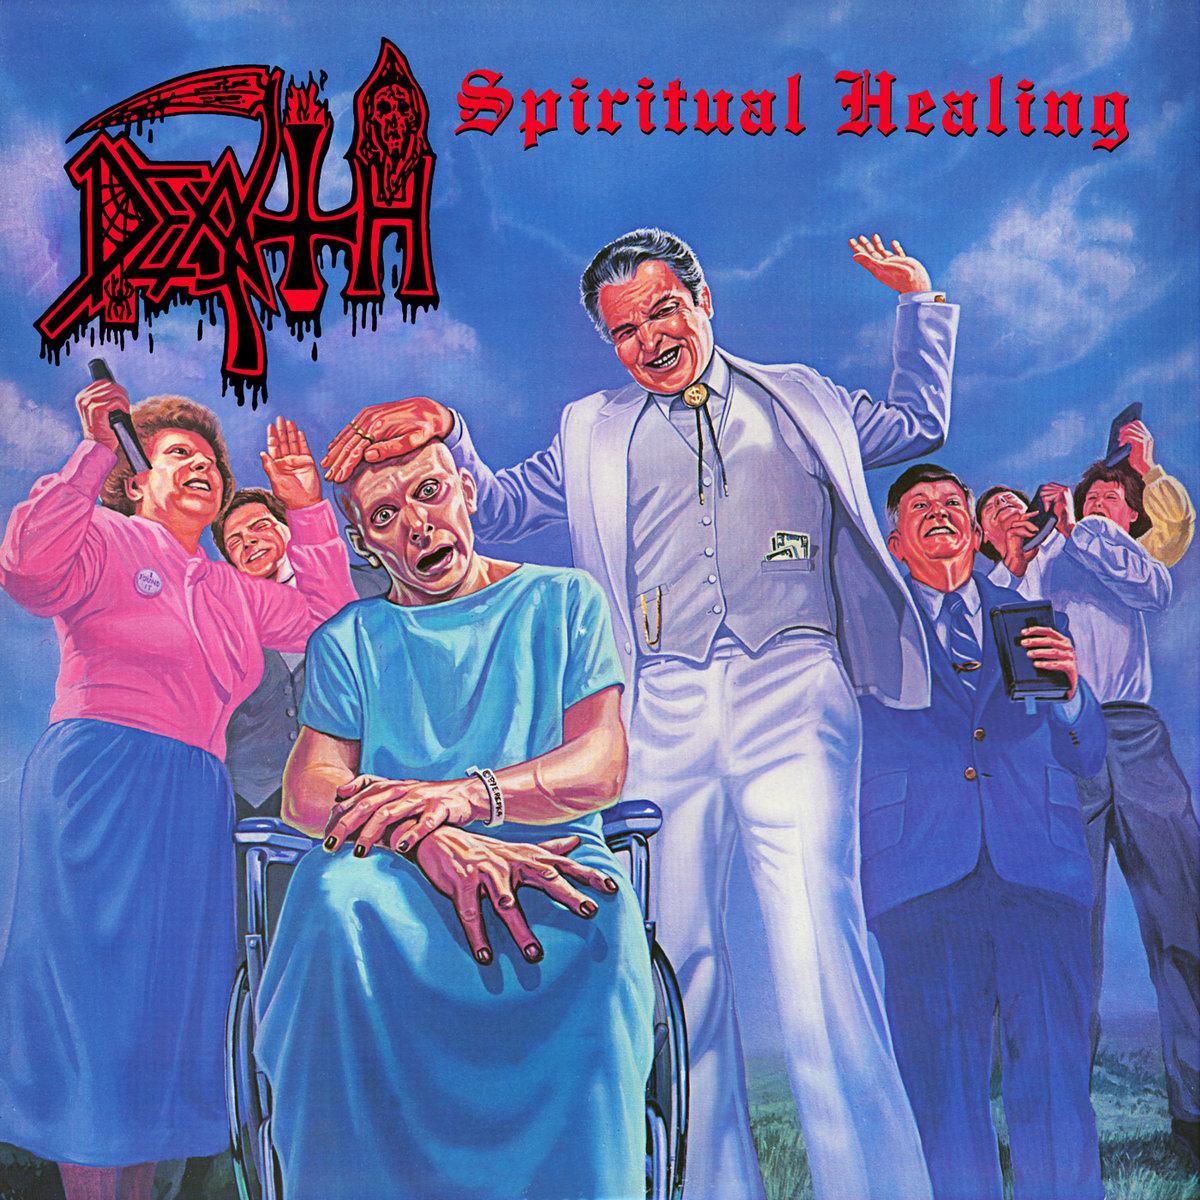 Death - Spiritual Healing (Deluxe Reissue 2012)